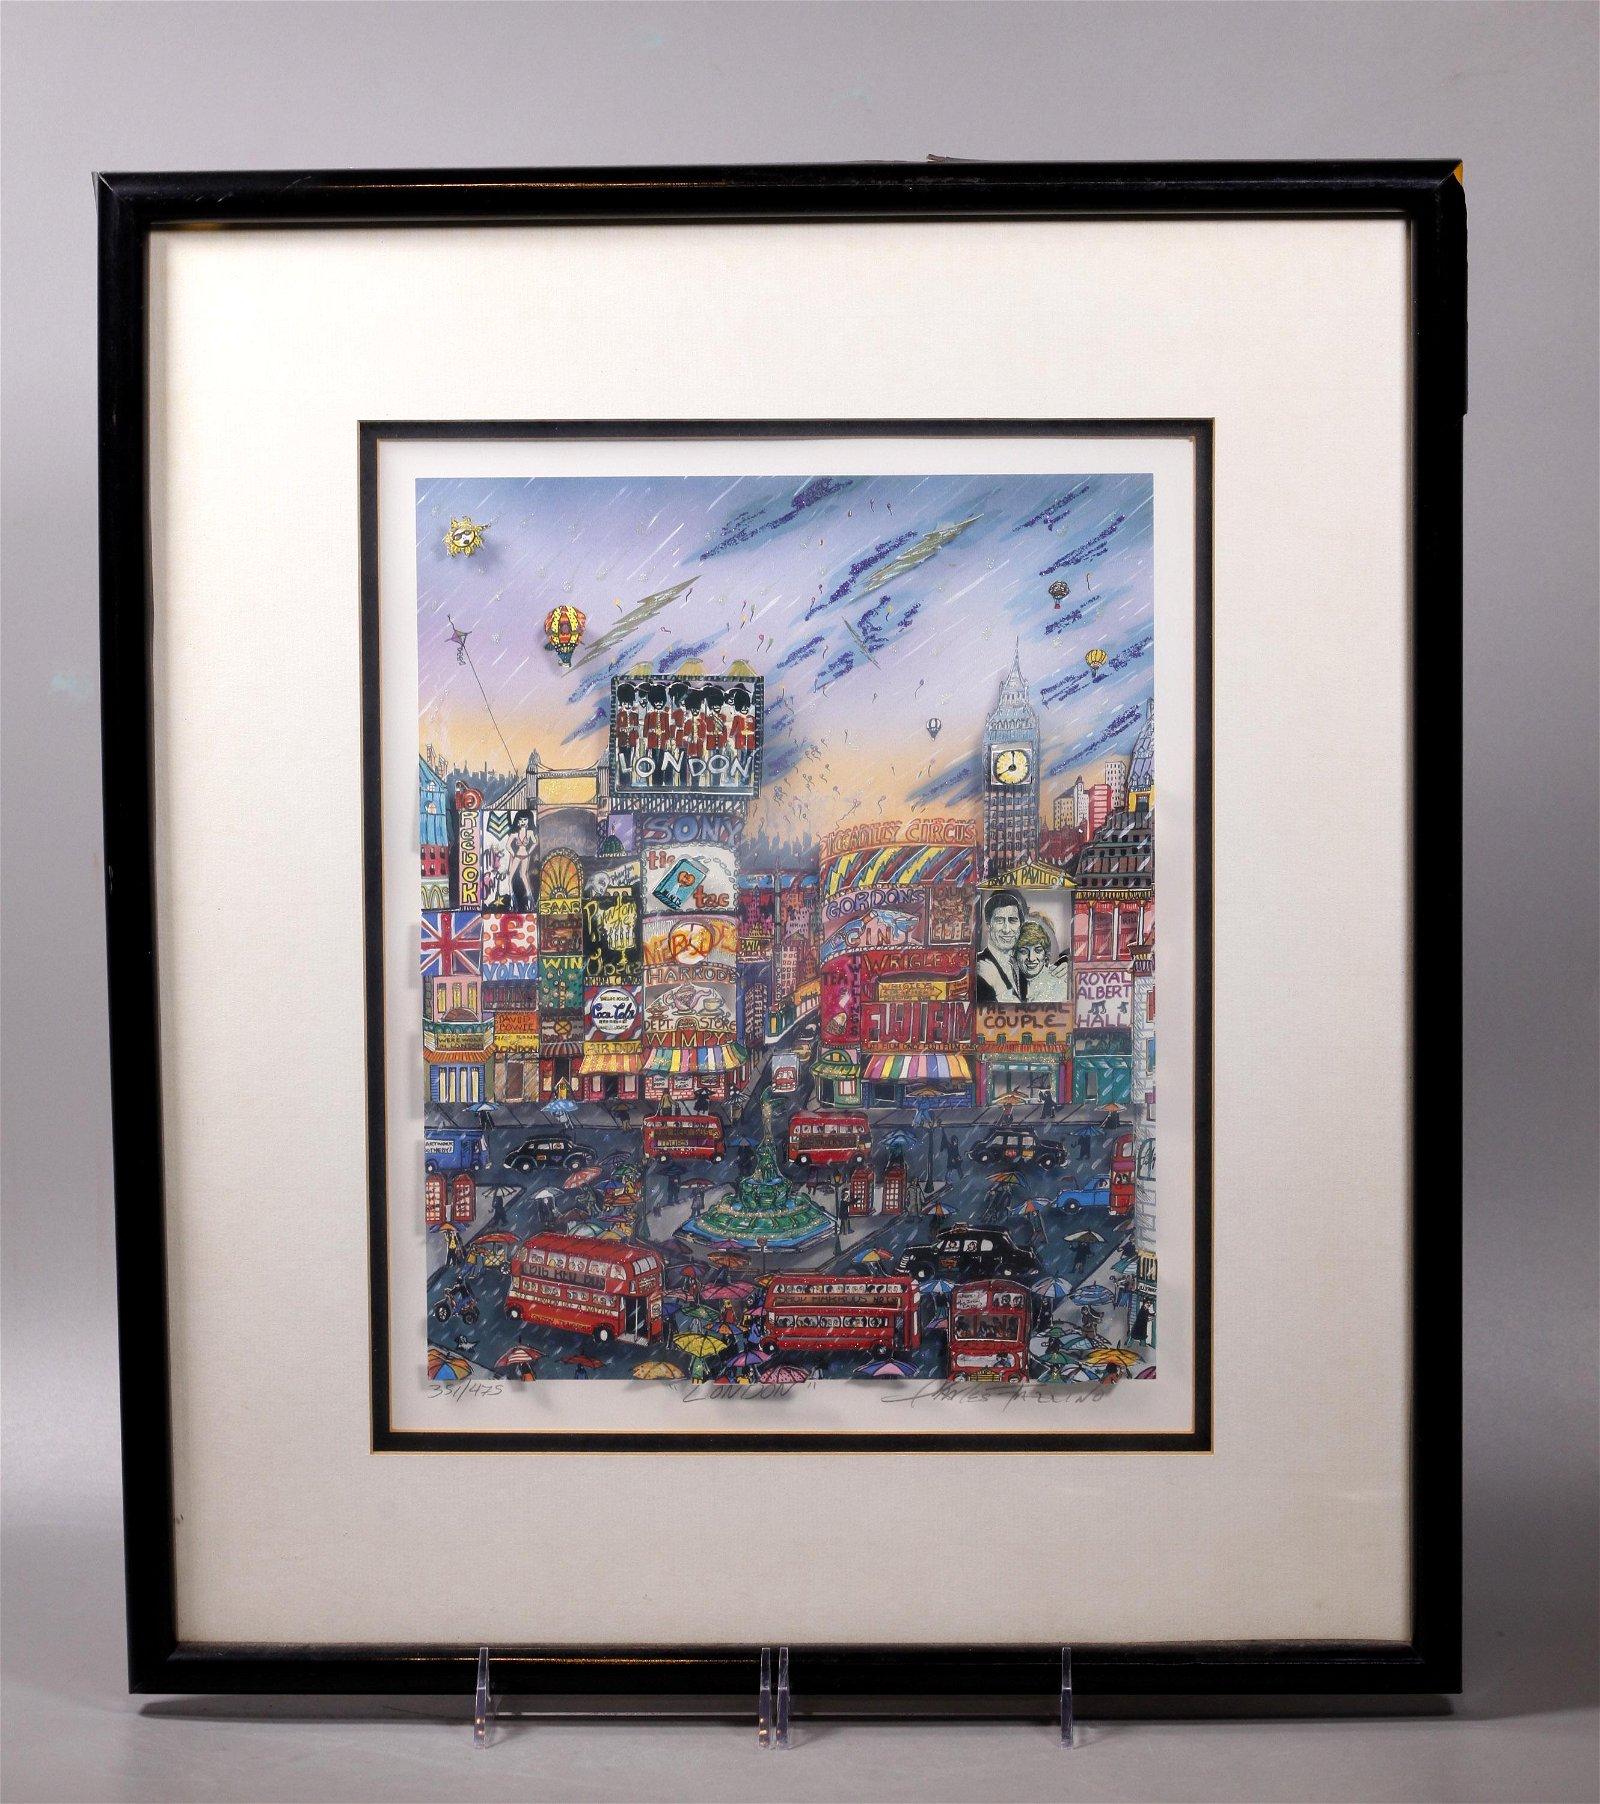 Charles Fazzino; London 3-D Serigraph 1997